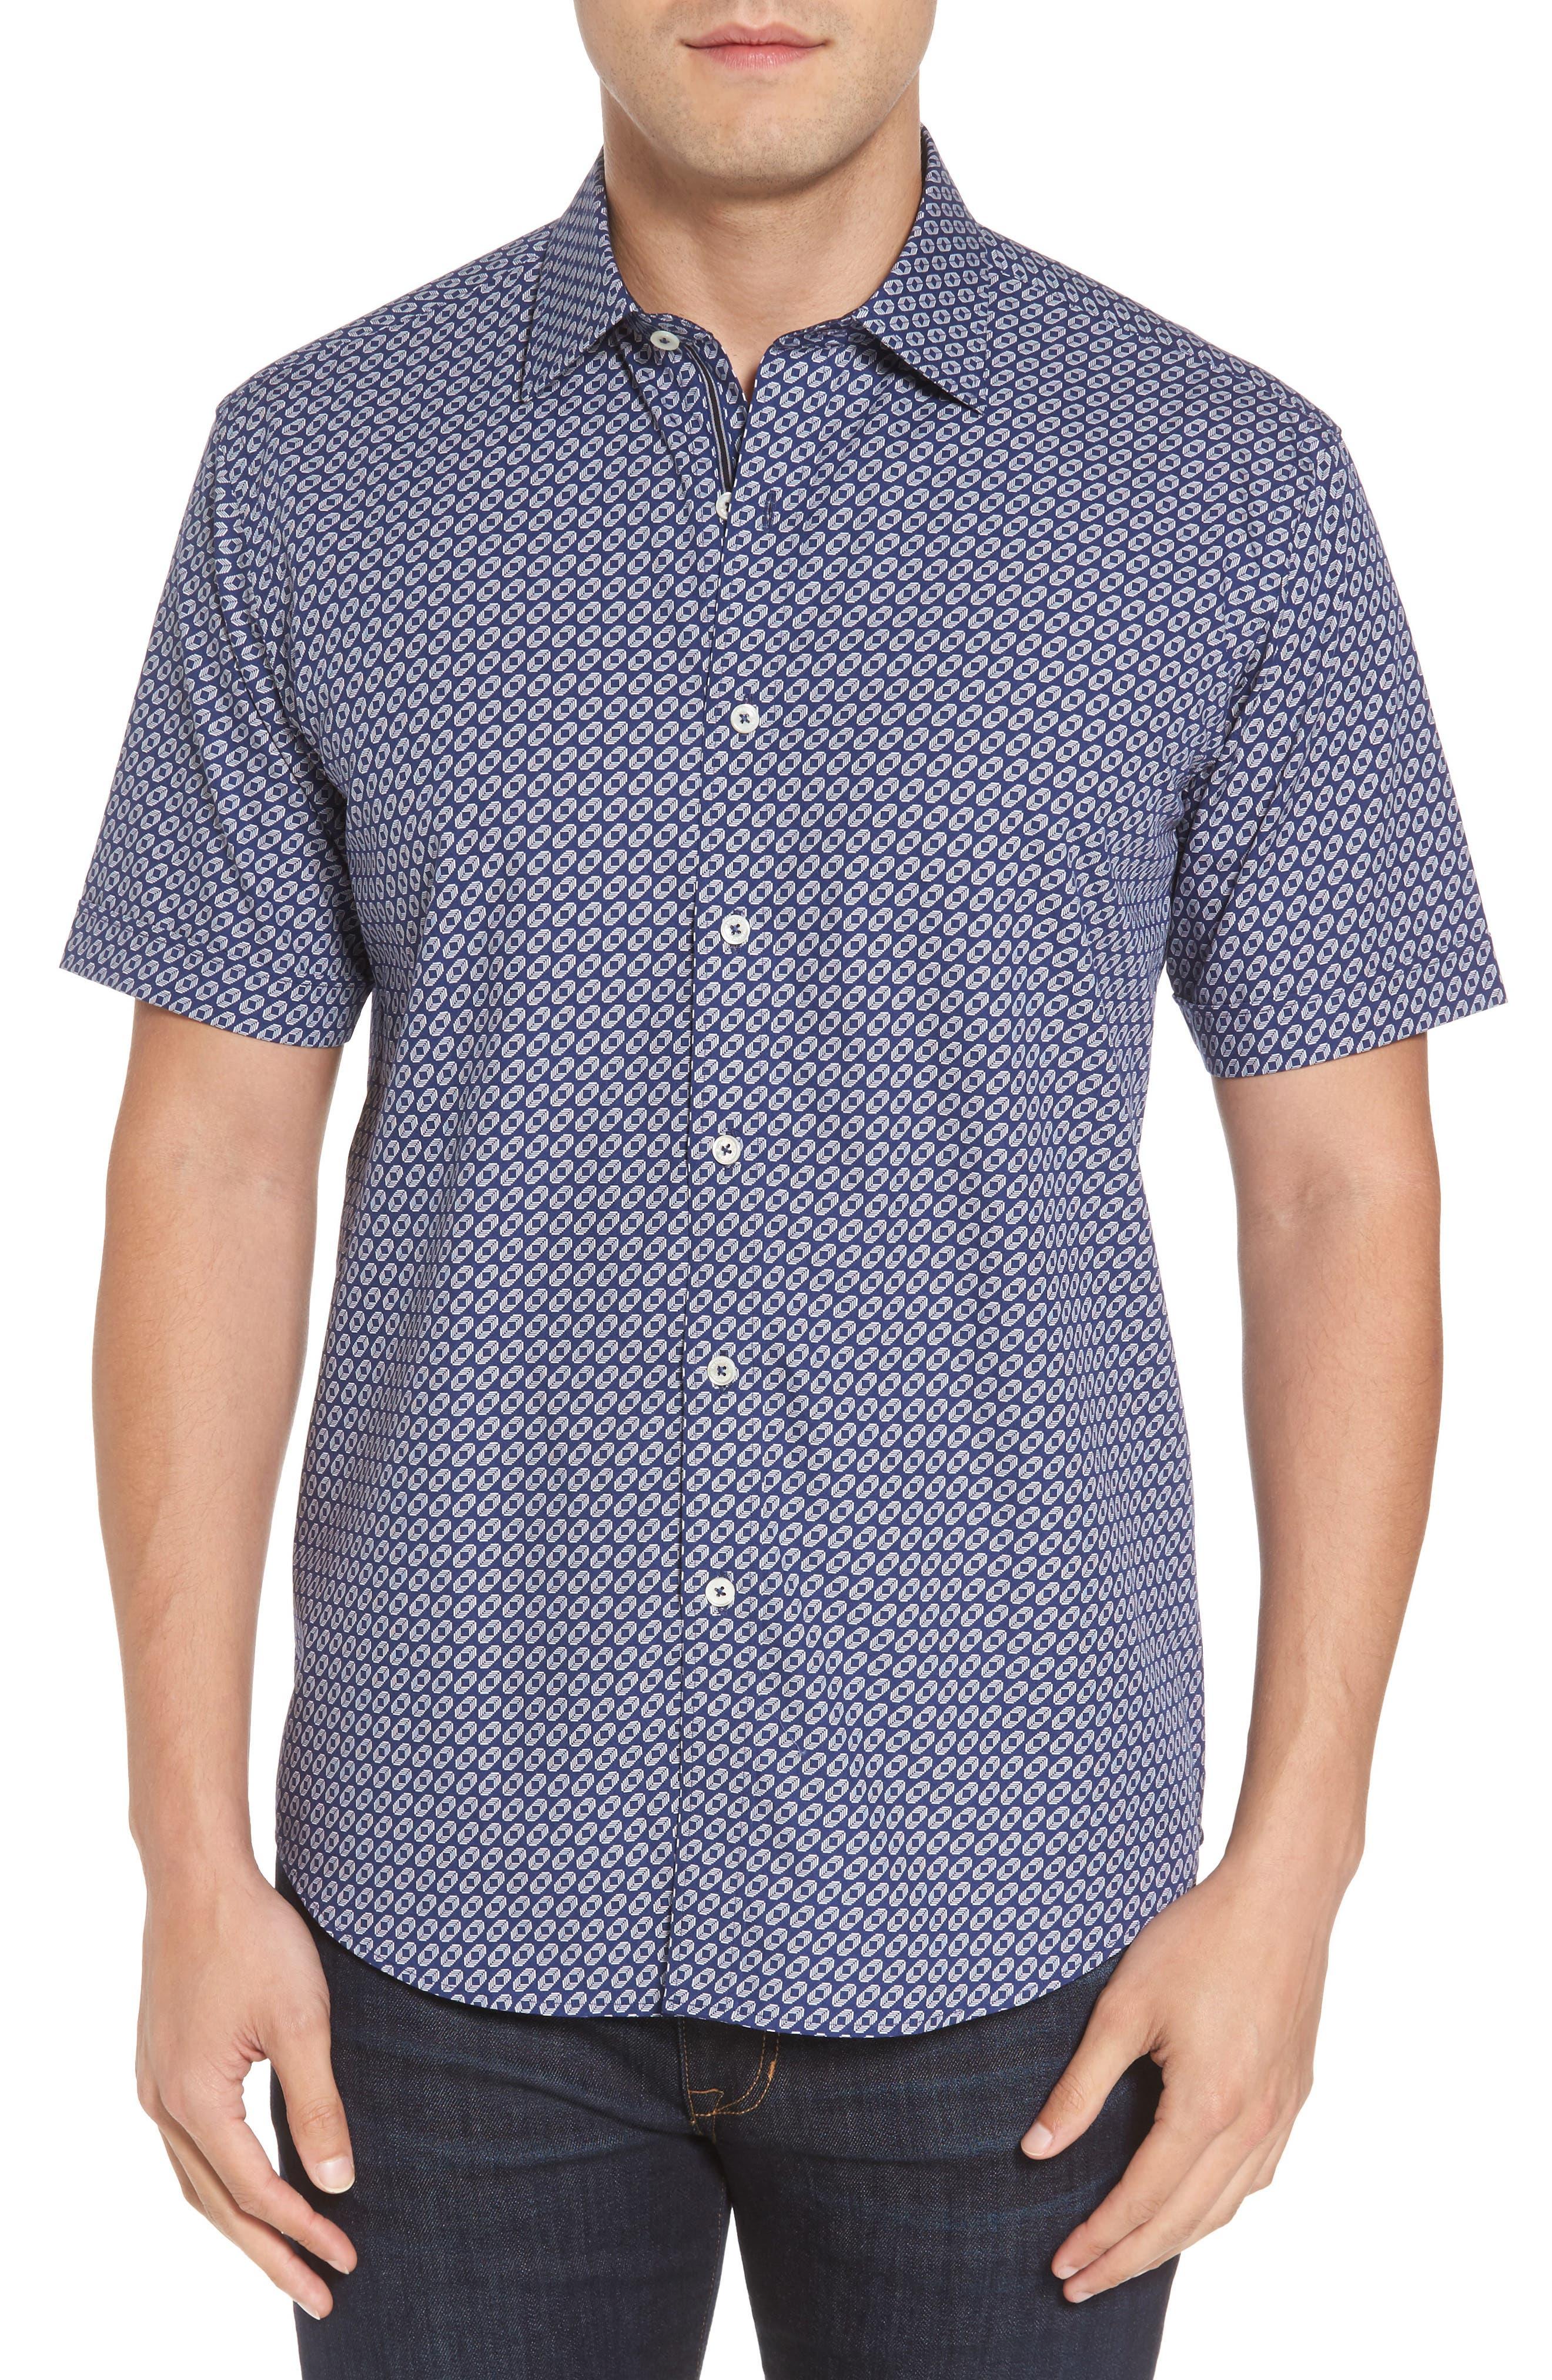 Alternate Image 1 Selected - Bugatchi Shaped Fit Geo Print Sport Shirt